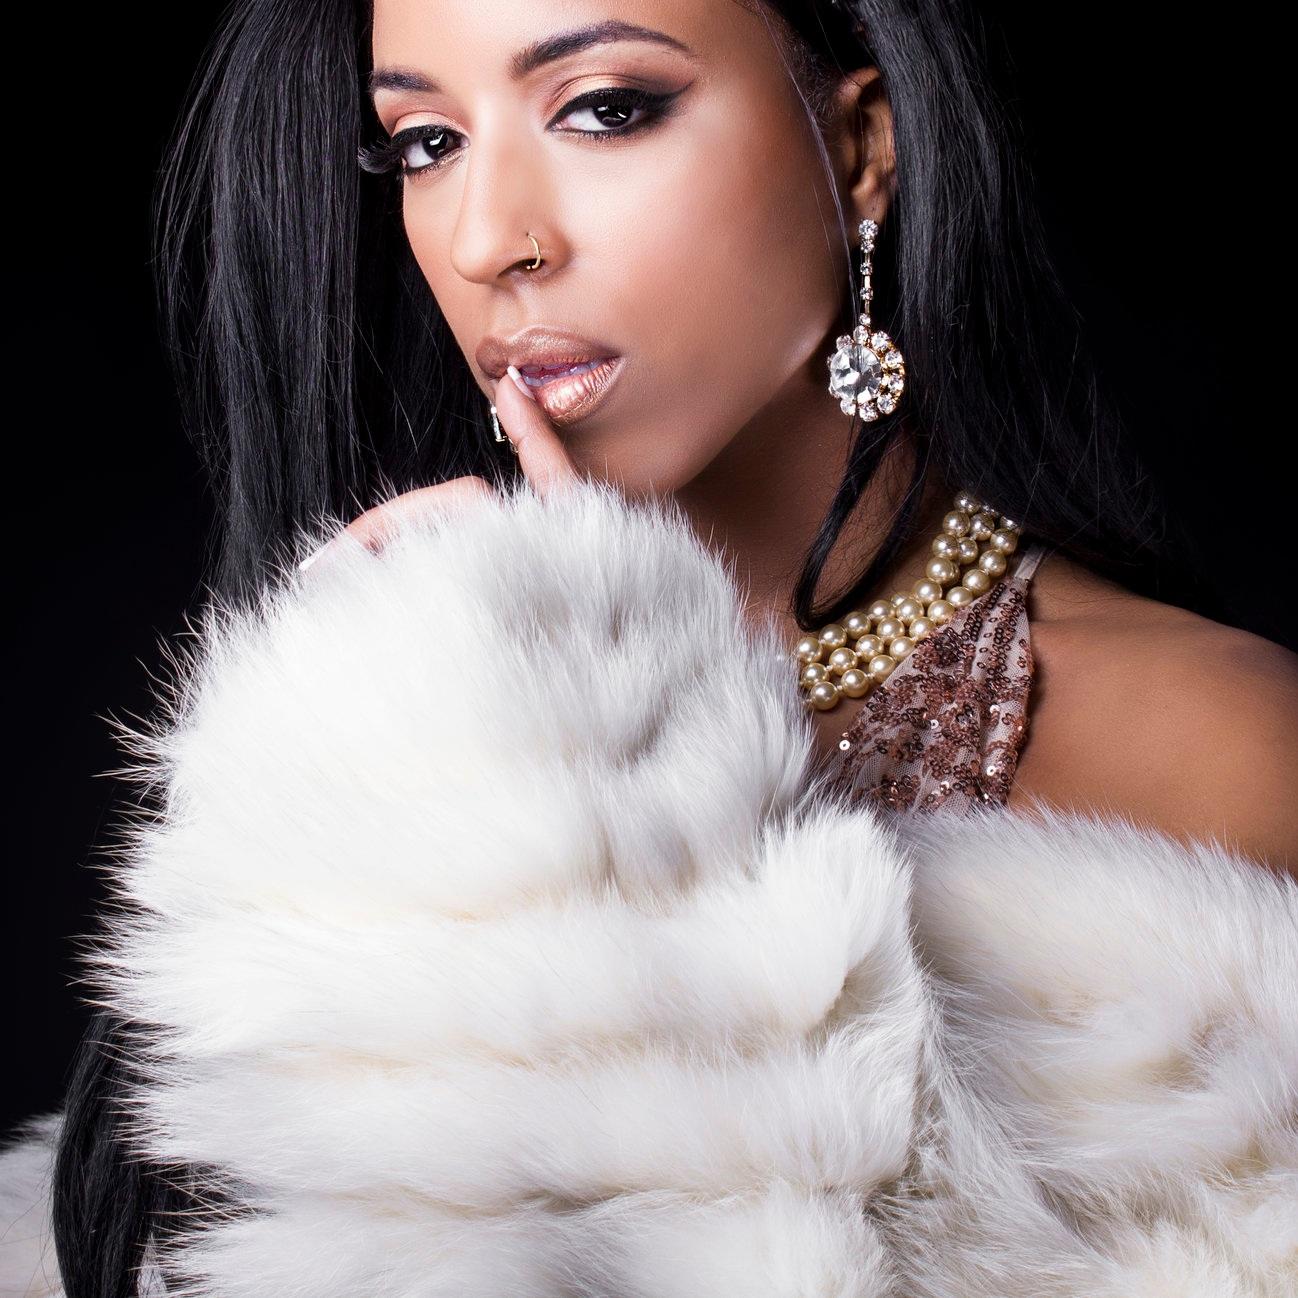 Brooke Jay